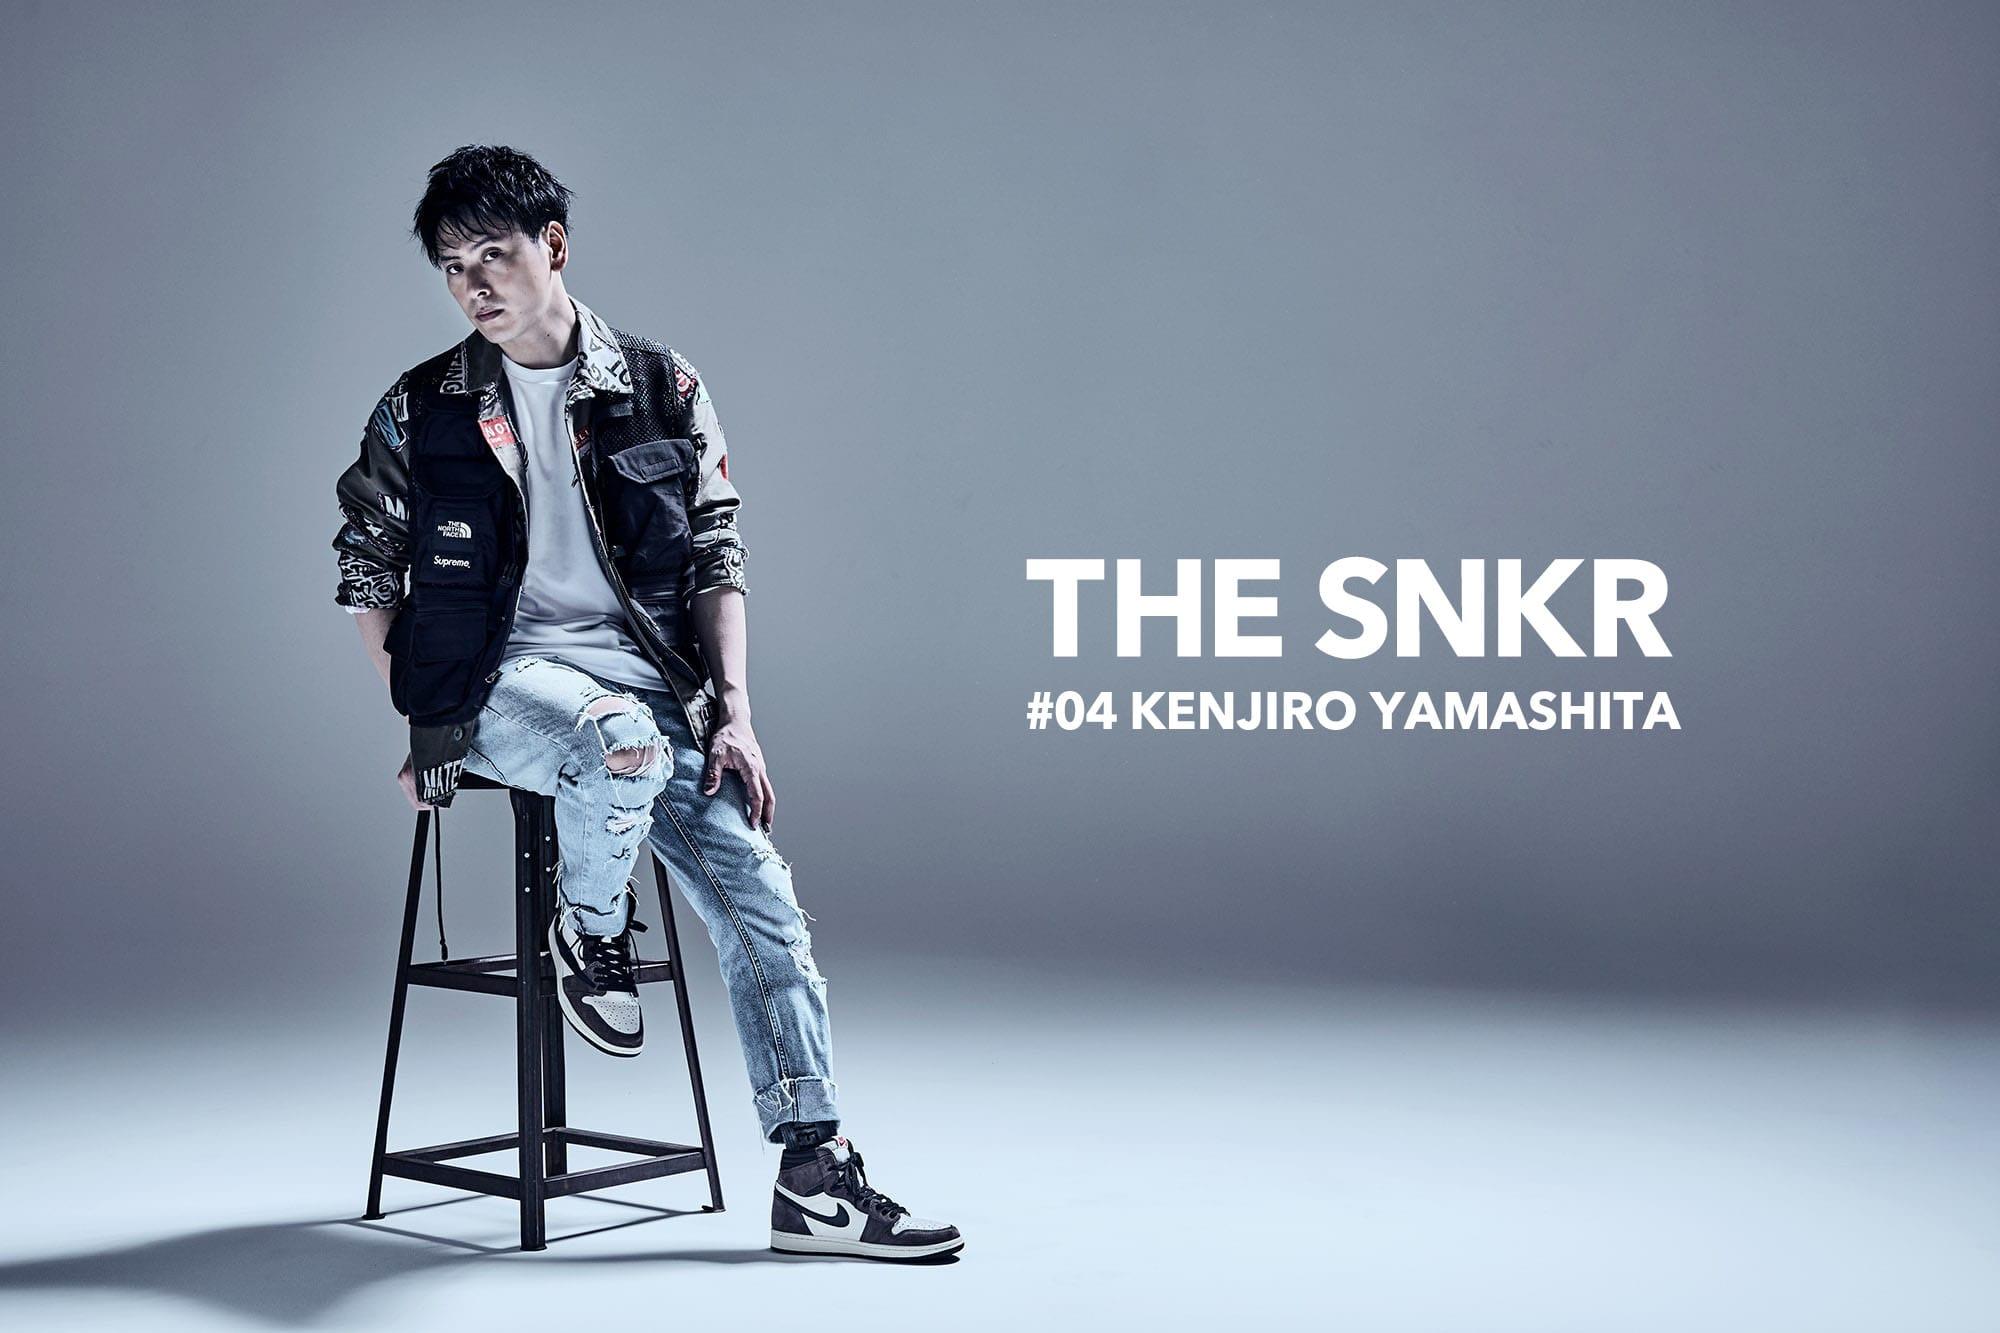 THE SNKR #04 山下健二郎